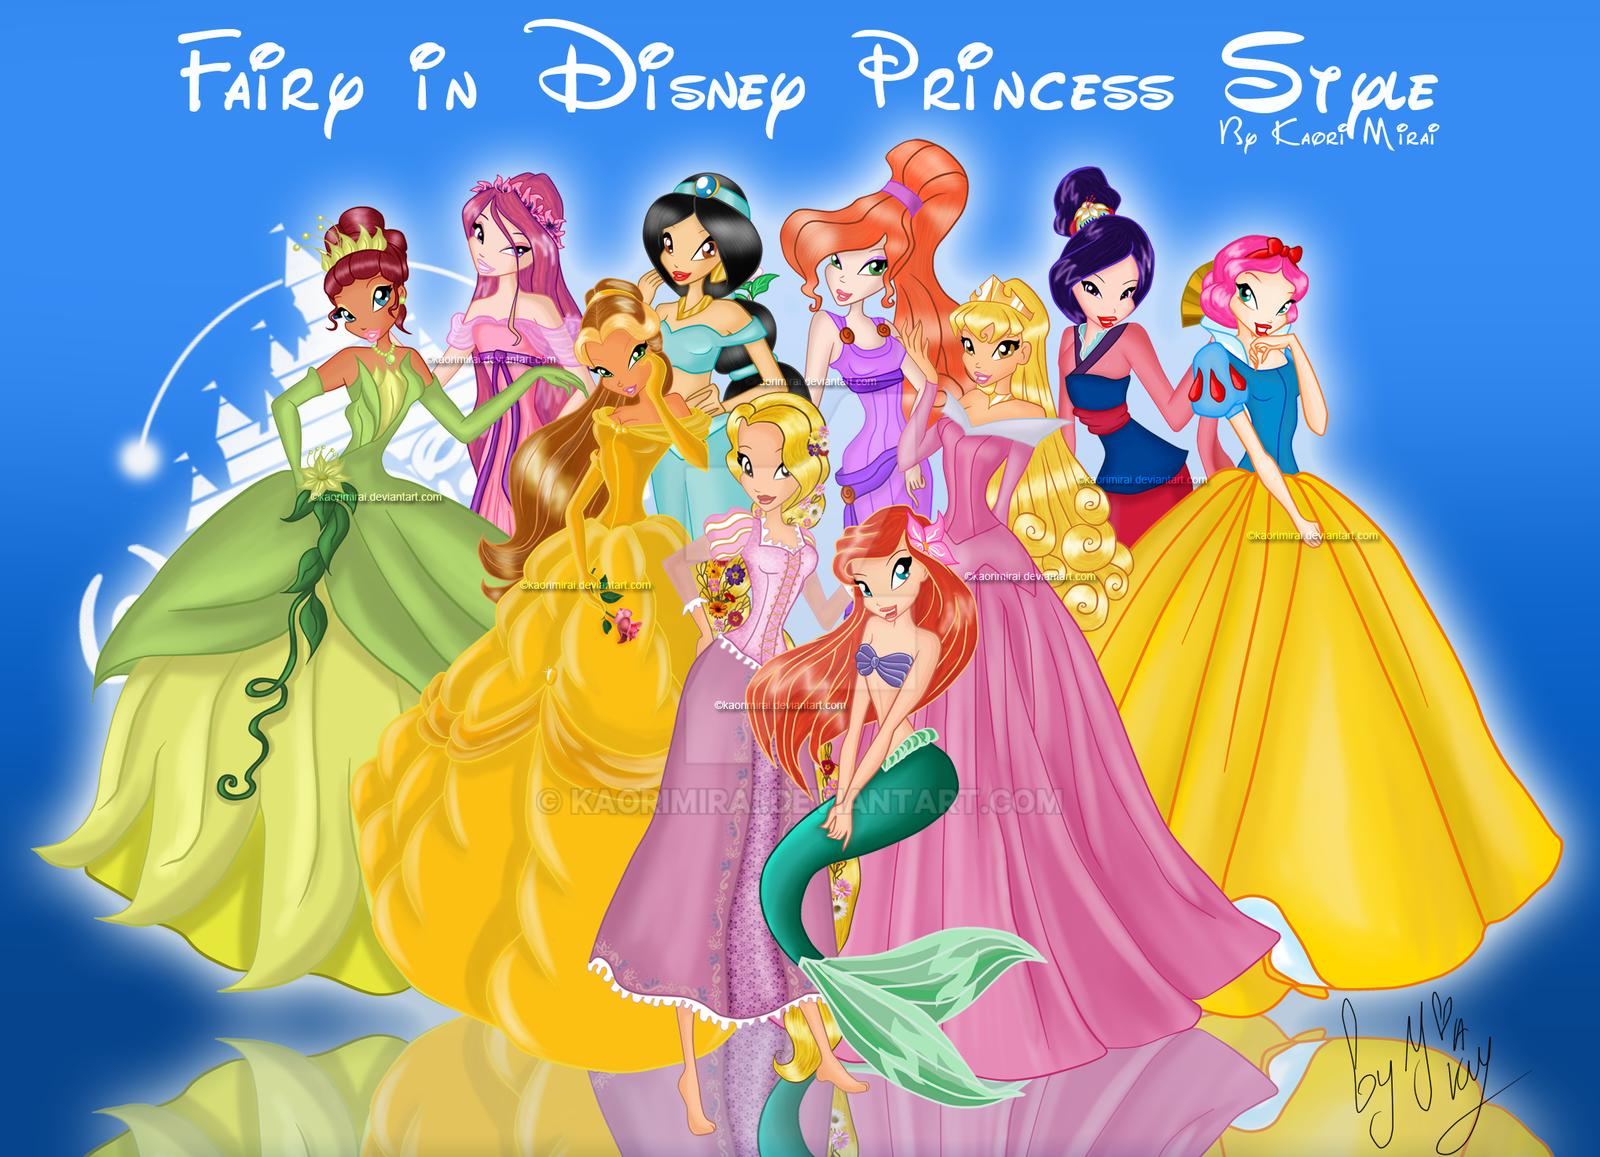 Fairy in Disney Princess Style by KaoriMirai on DeviantArt